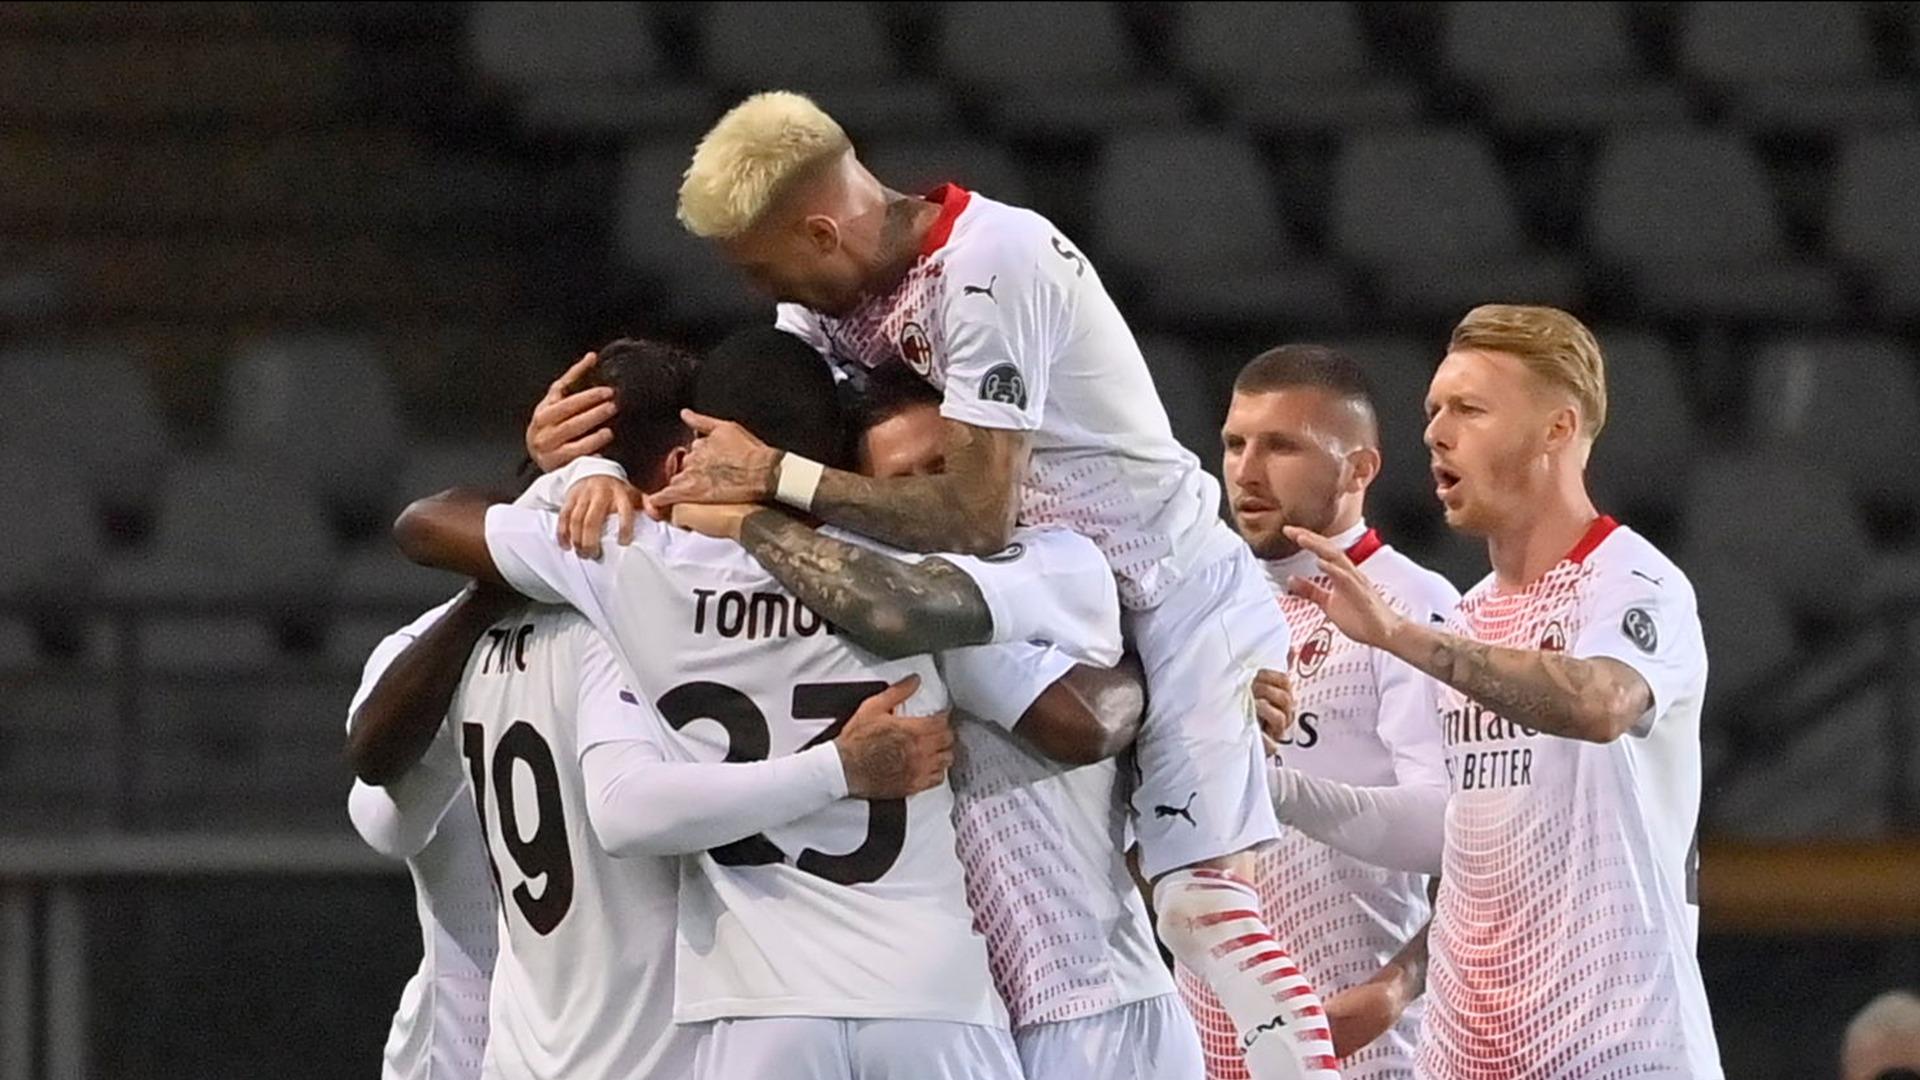 Torino 0-7 Milan: Rebic scores quickfire hat-trick as Rossoneri run riot